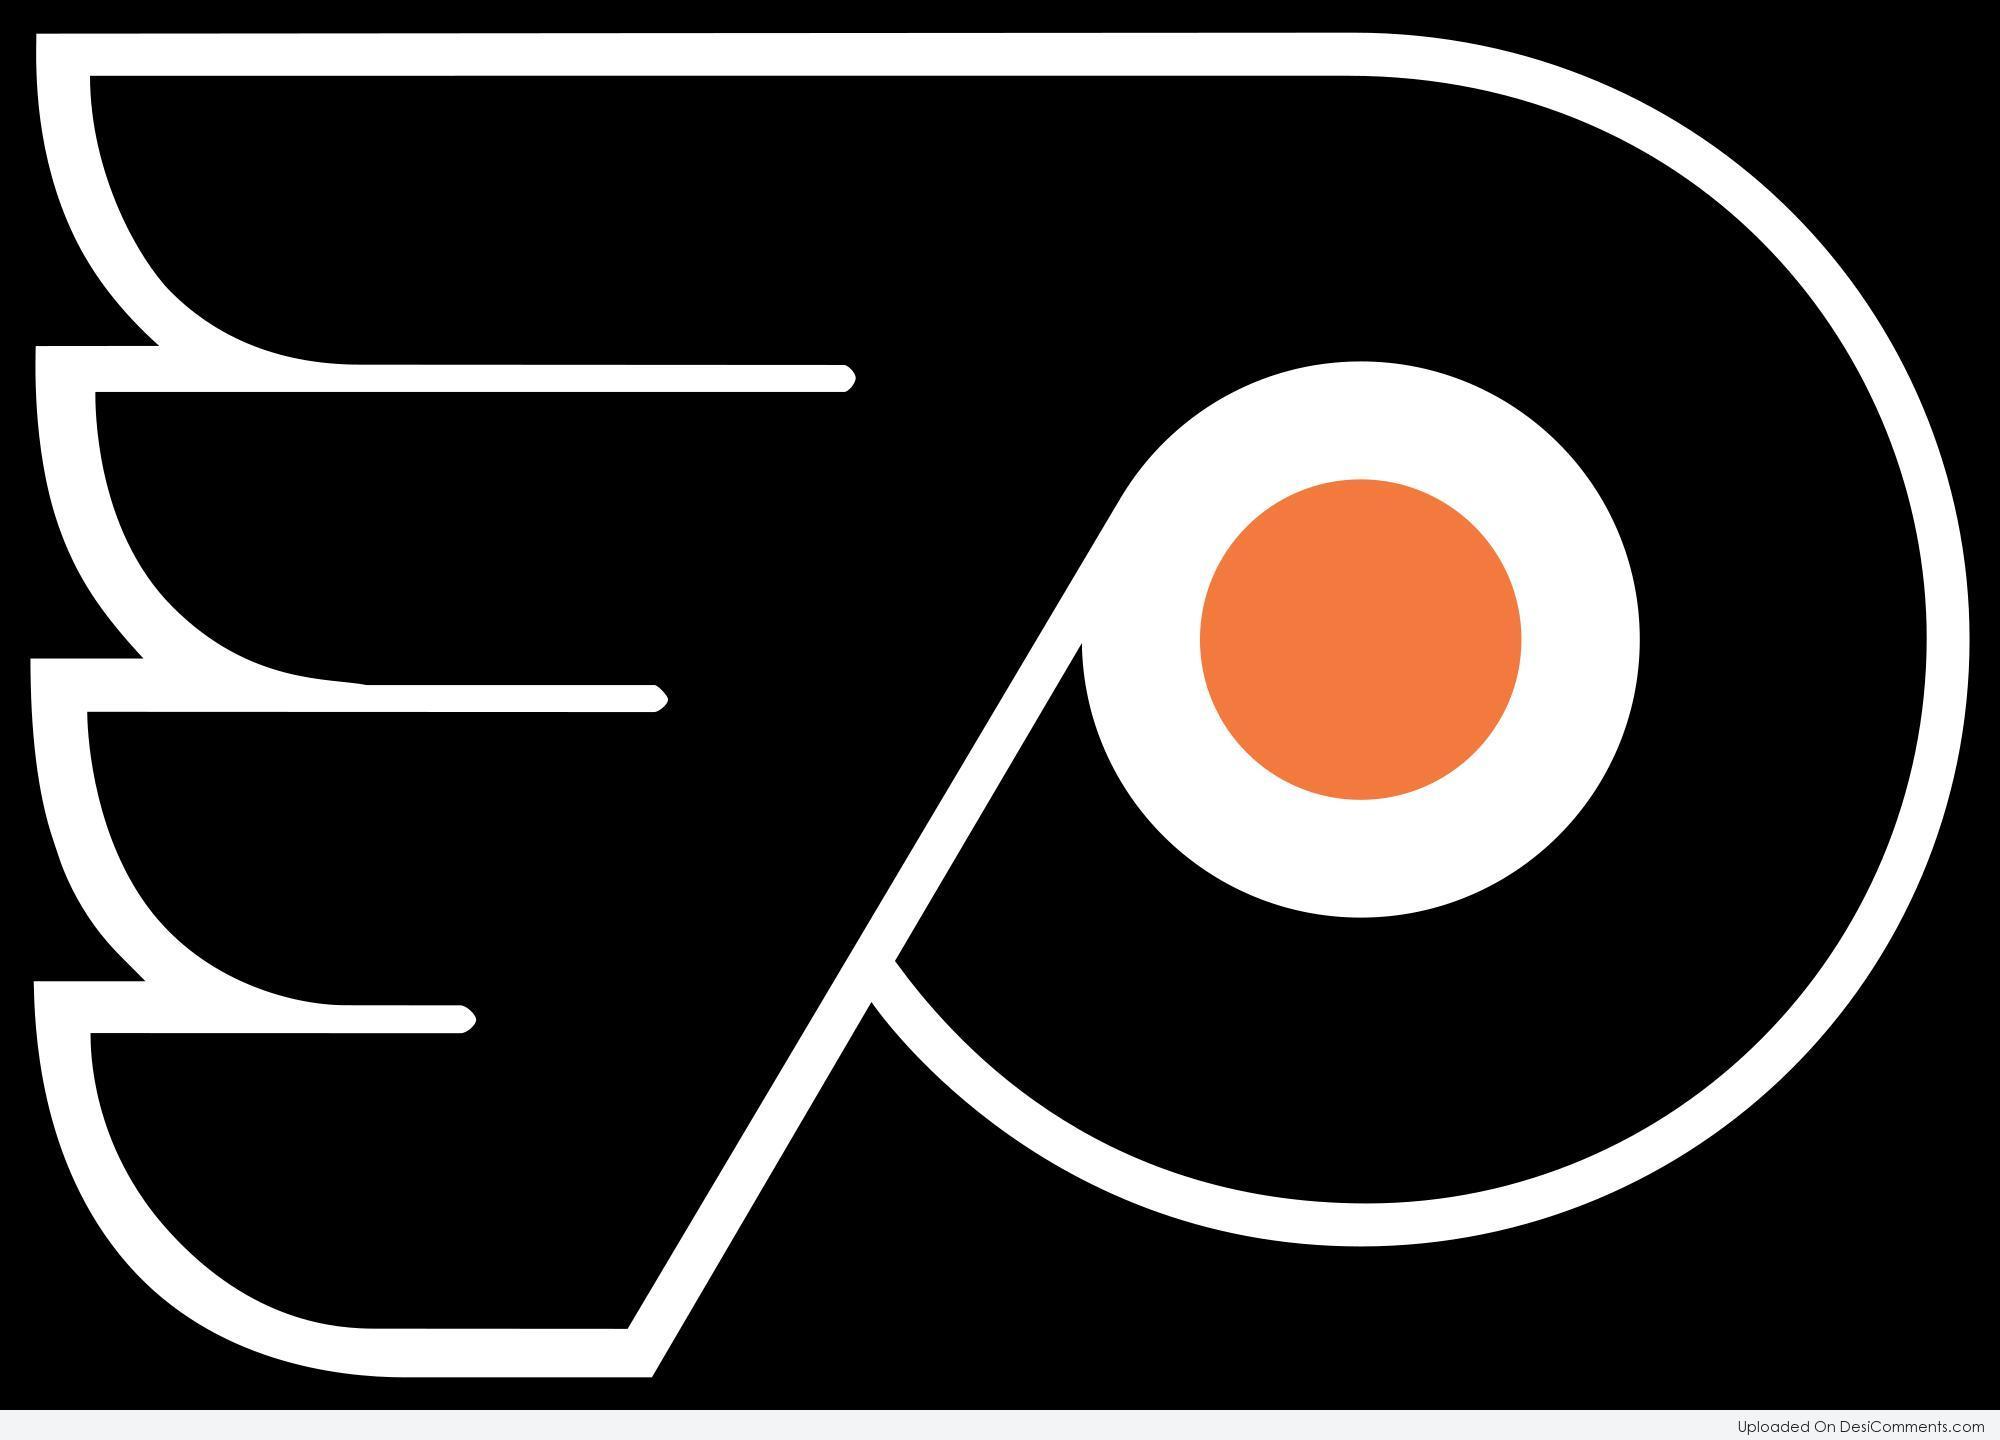 Philadelphia Flyers Logo DesiCommentscom 2000x1440